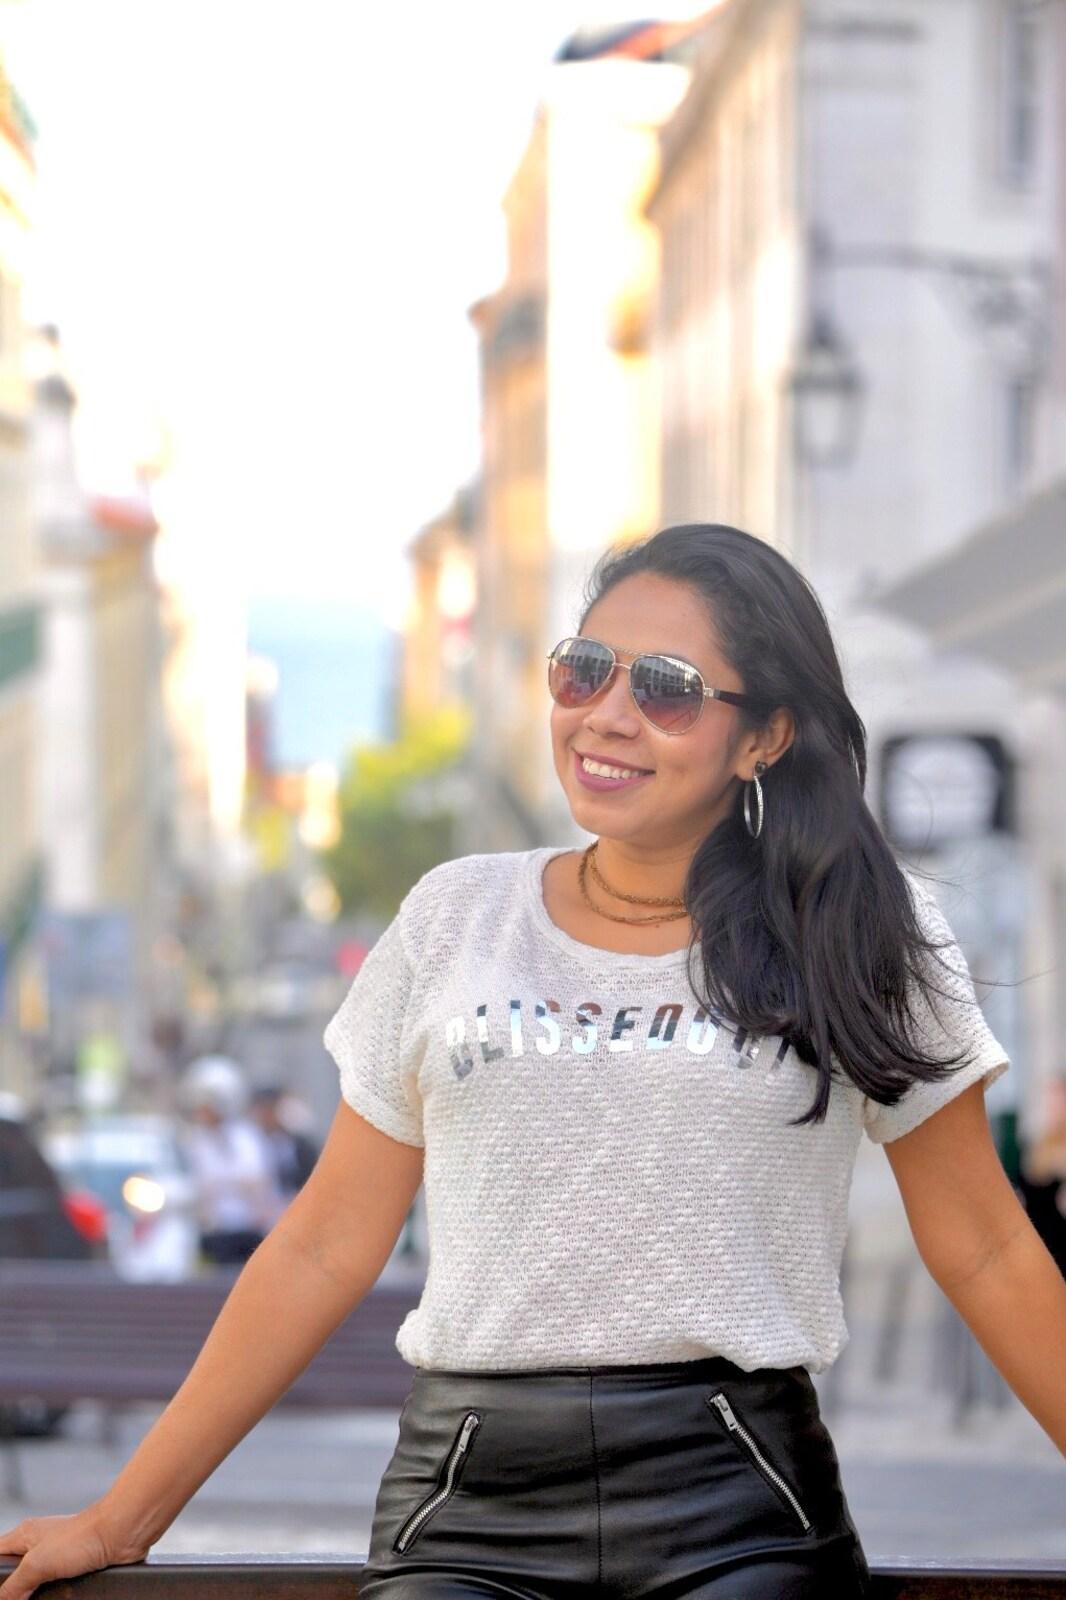 City Portrait Experience Lisboa